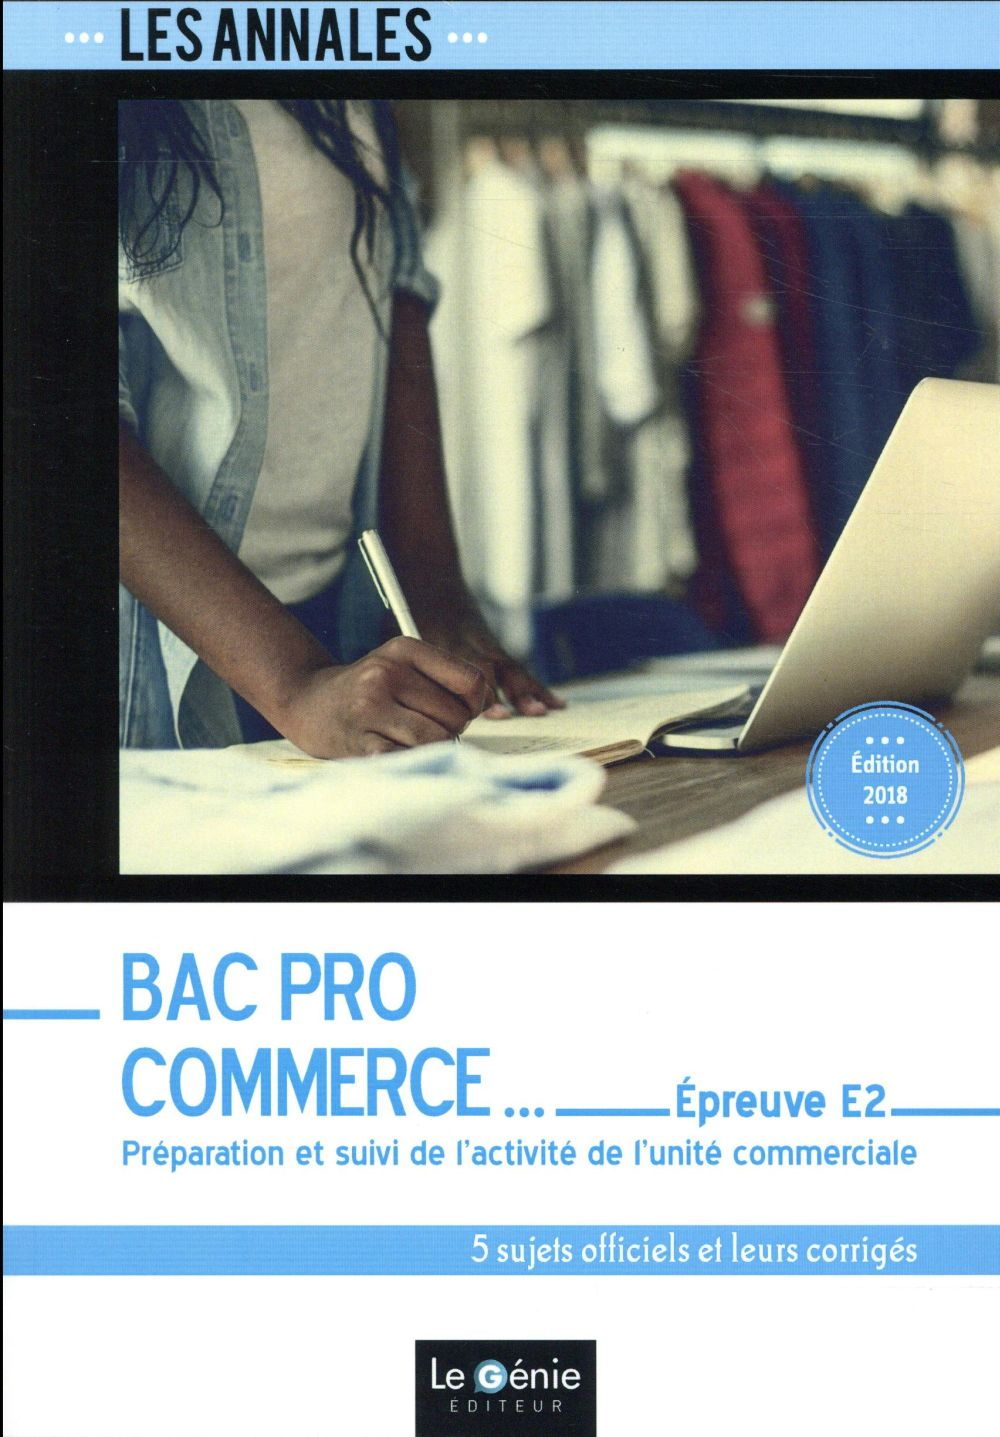 BAC PRO COMMERCE - EPREUVE E2